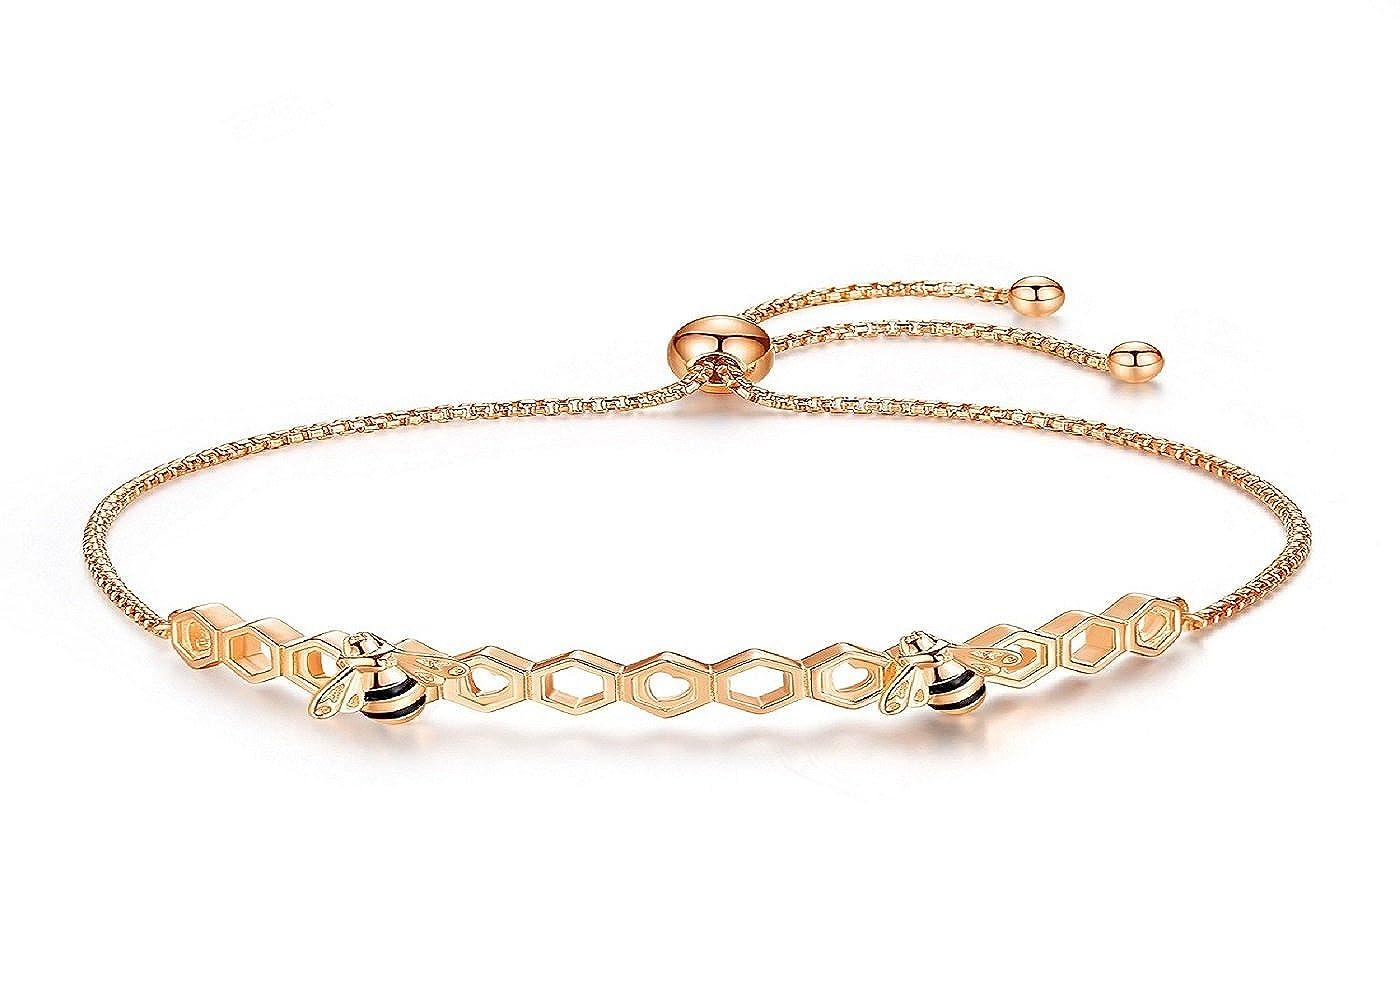 Presentski Sterling Silver Honeycomb Bee Bracelet Rose Gold Plated Adjustable Chain for Women Girls